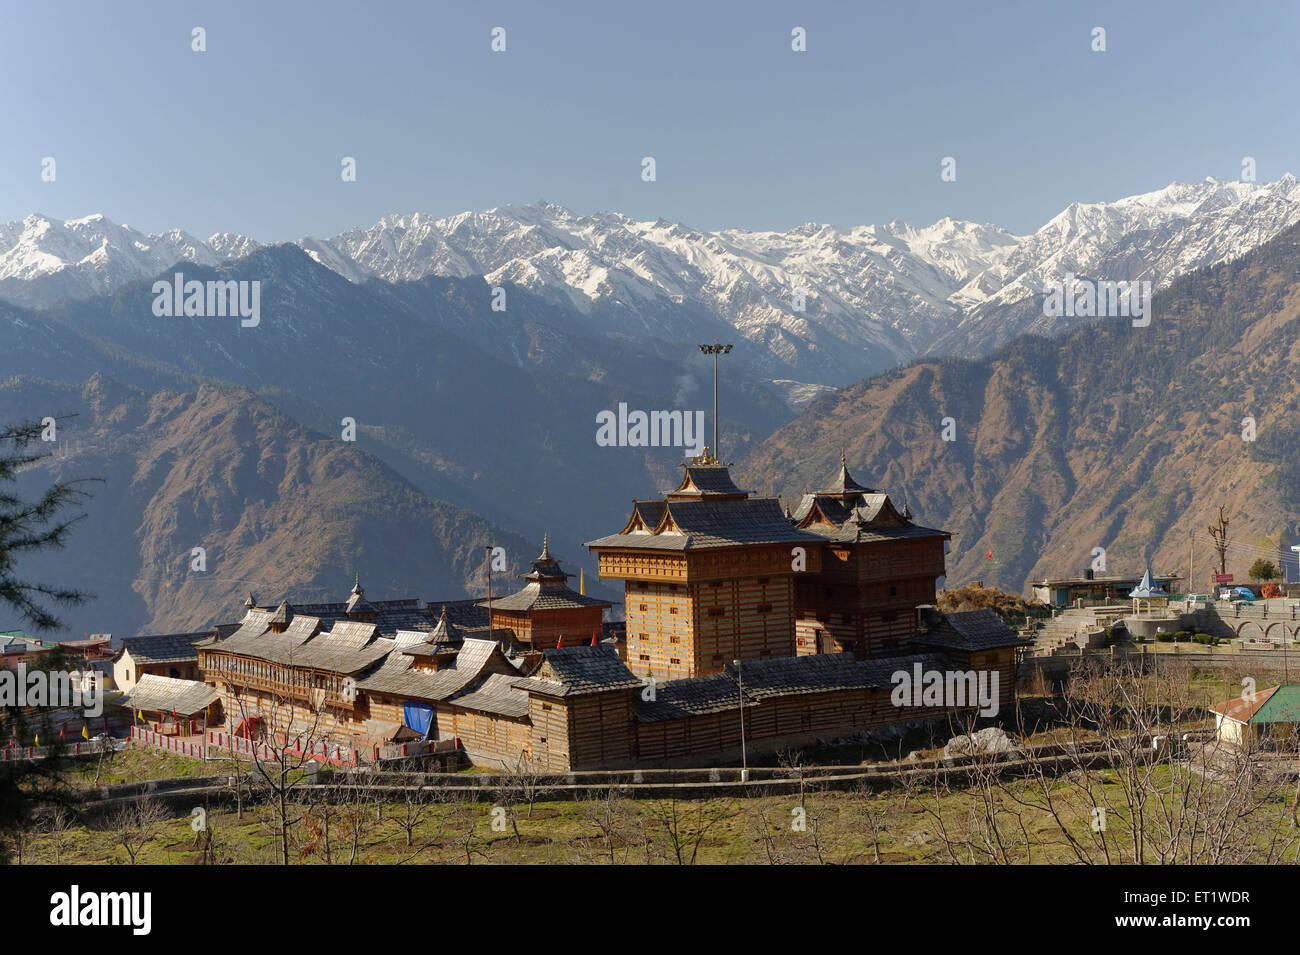 Bhima kali temple at sarahan himachal pradesh india Asia - Stock Image